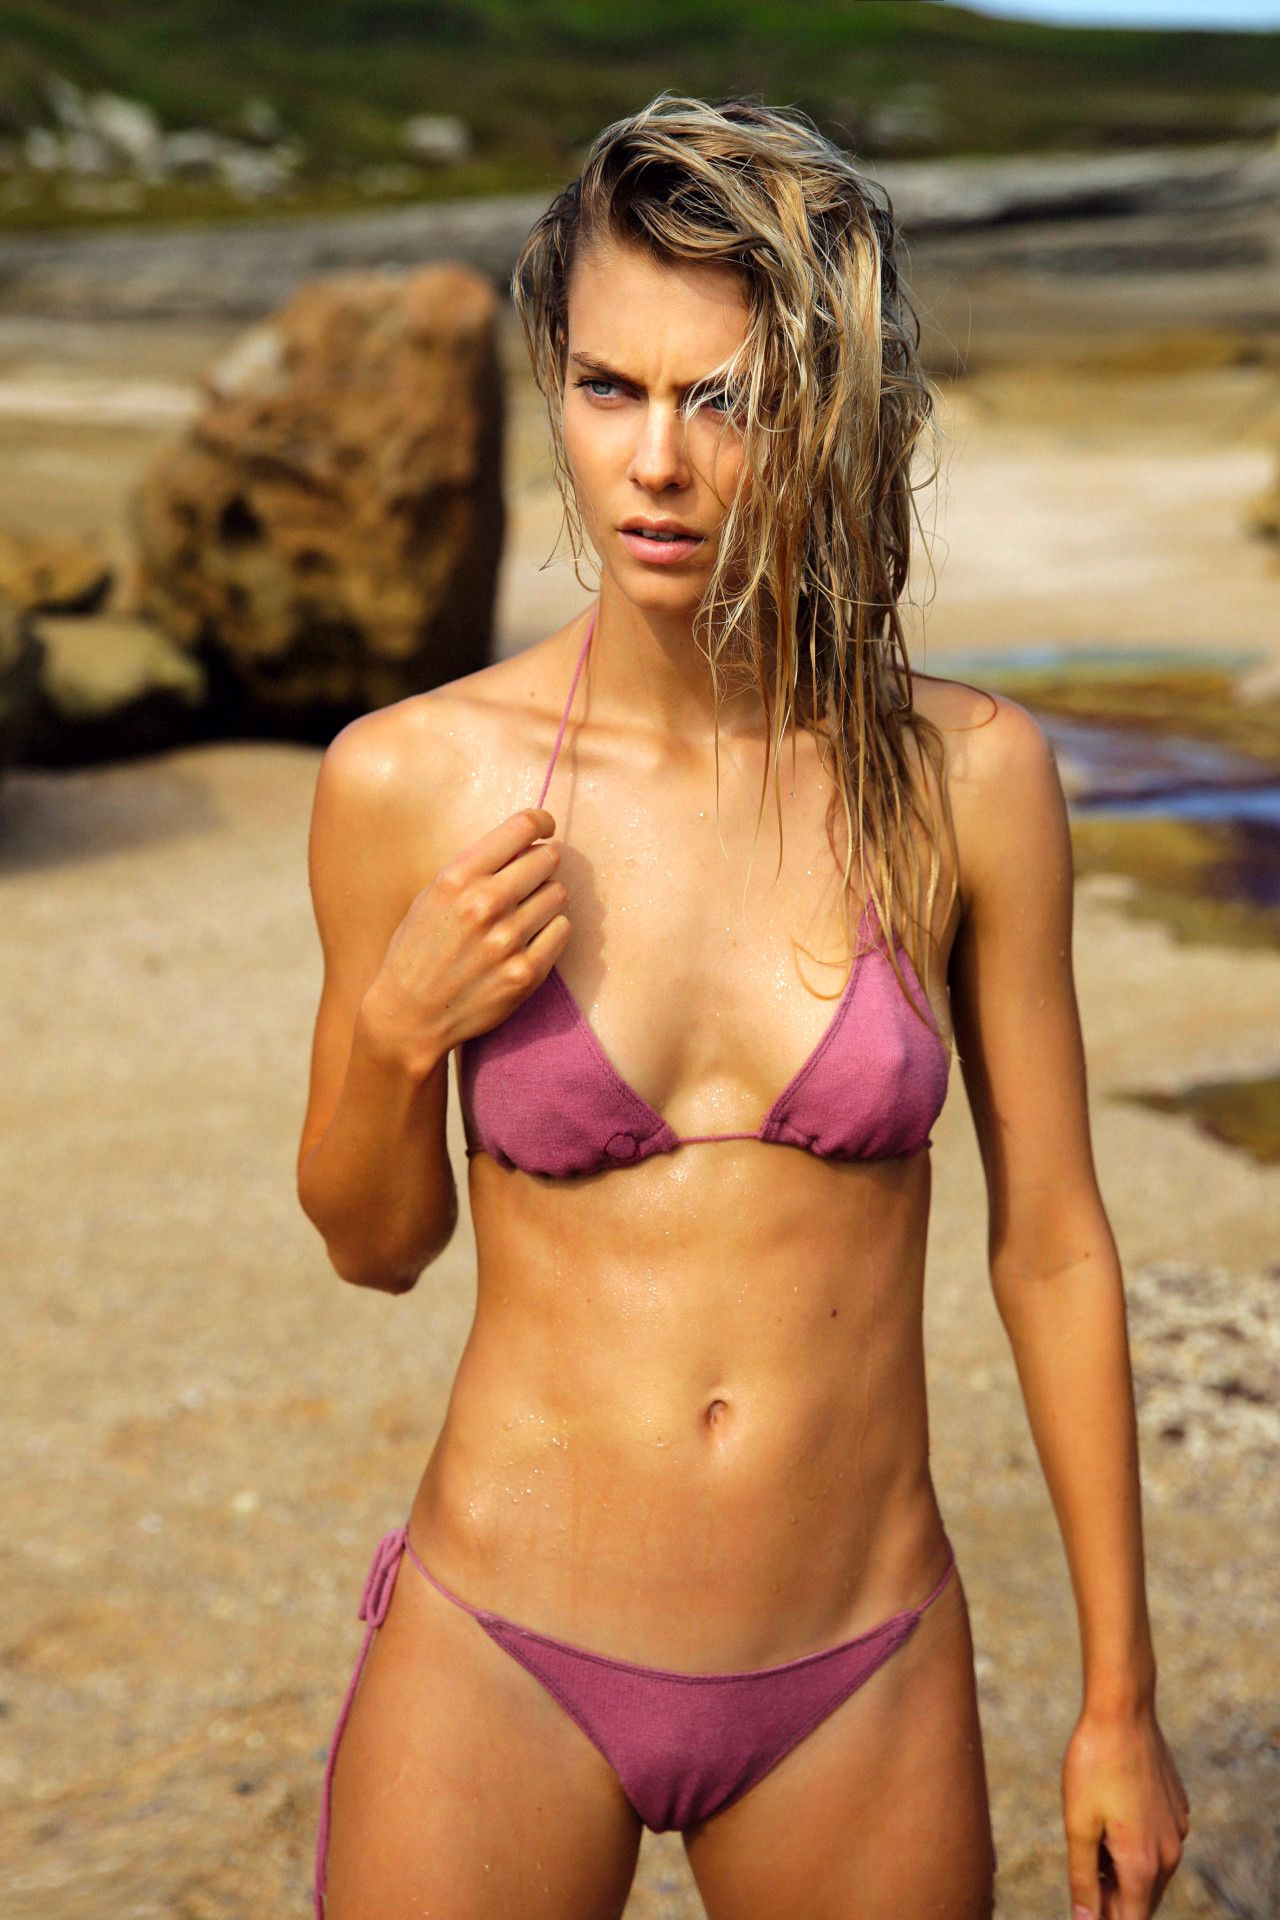 Top skinny nudist girls, daniel cudmore naked xxx men